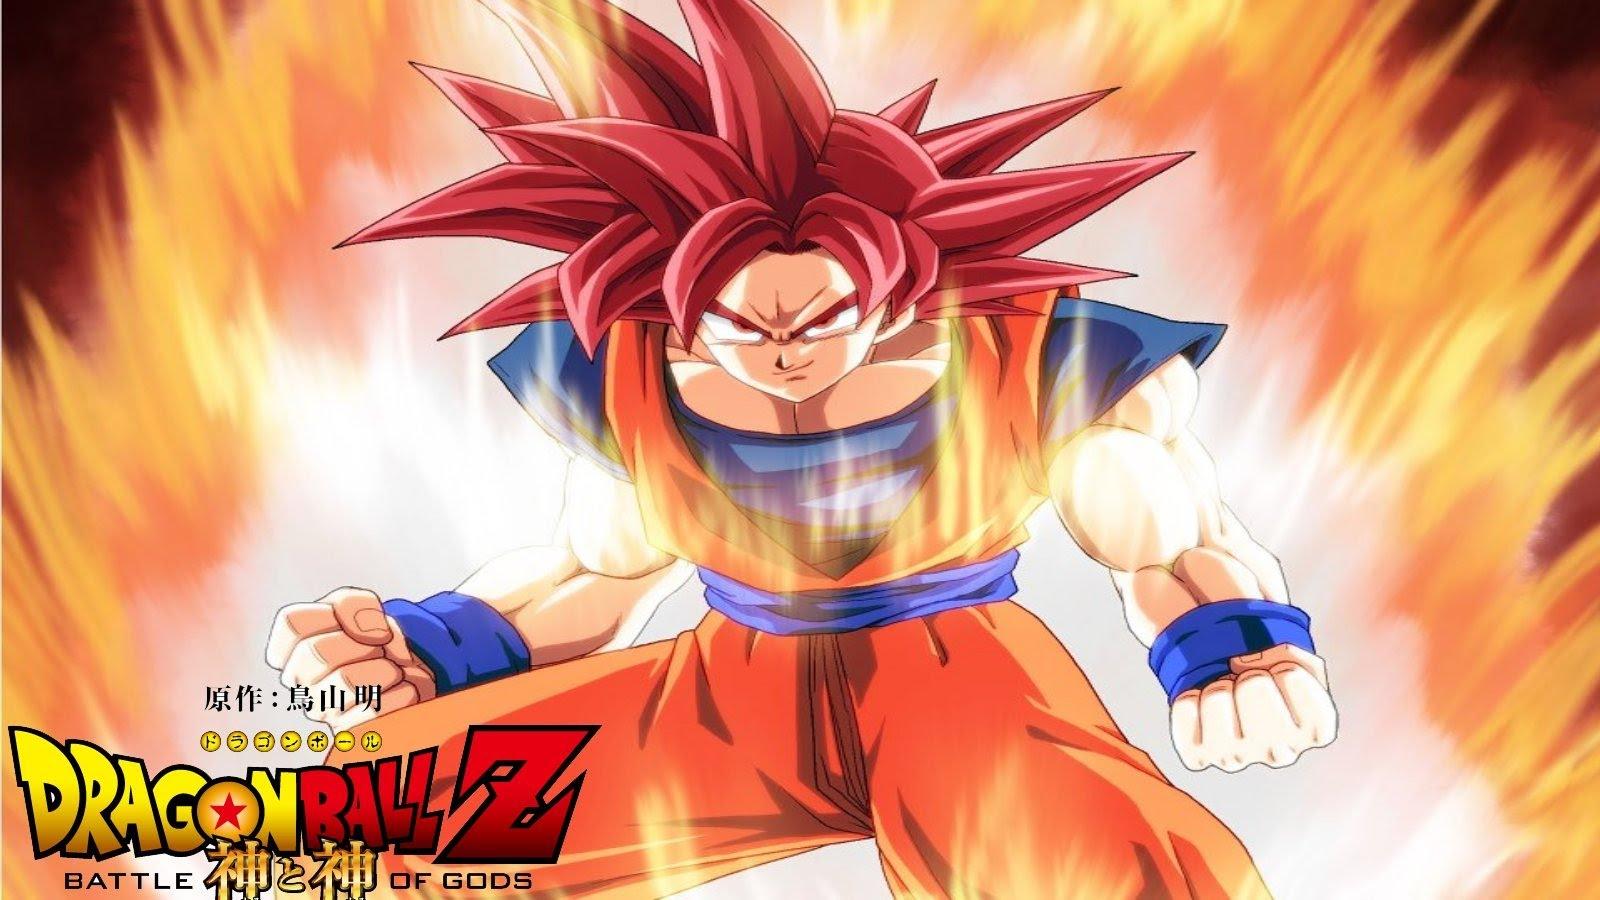 Free Download Gods Super Saiyan God Goku New Battle Of Gods Series